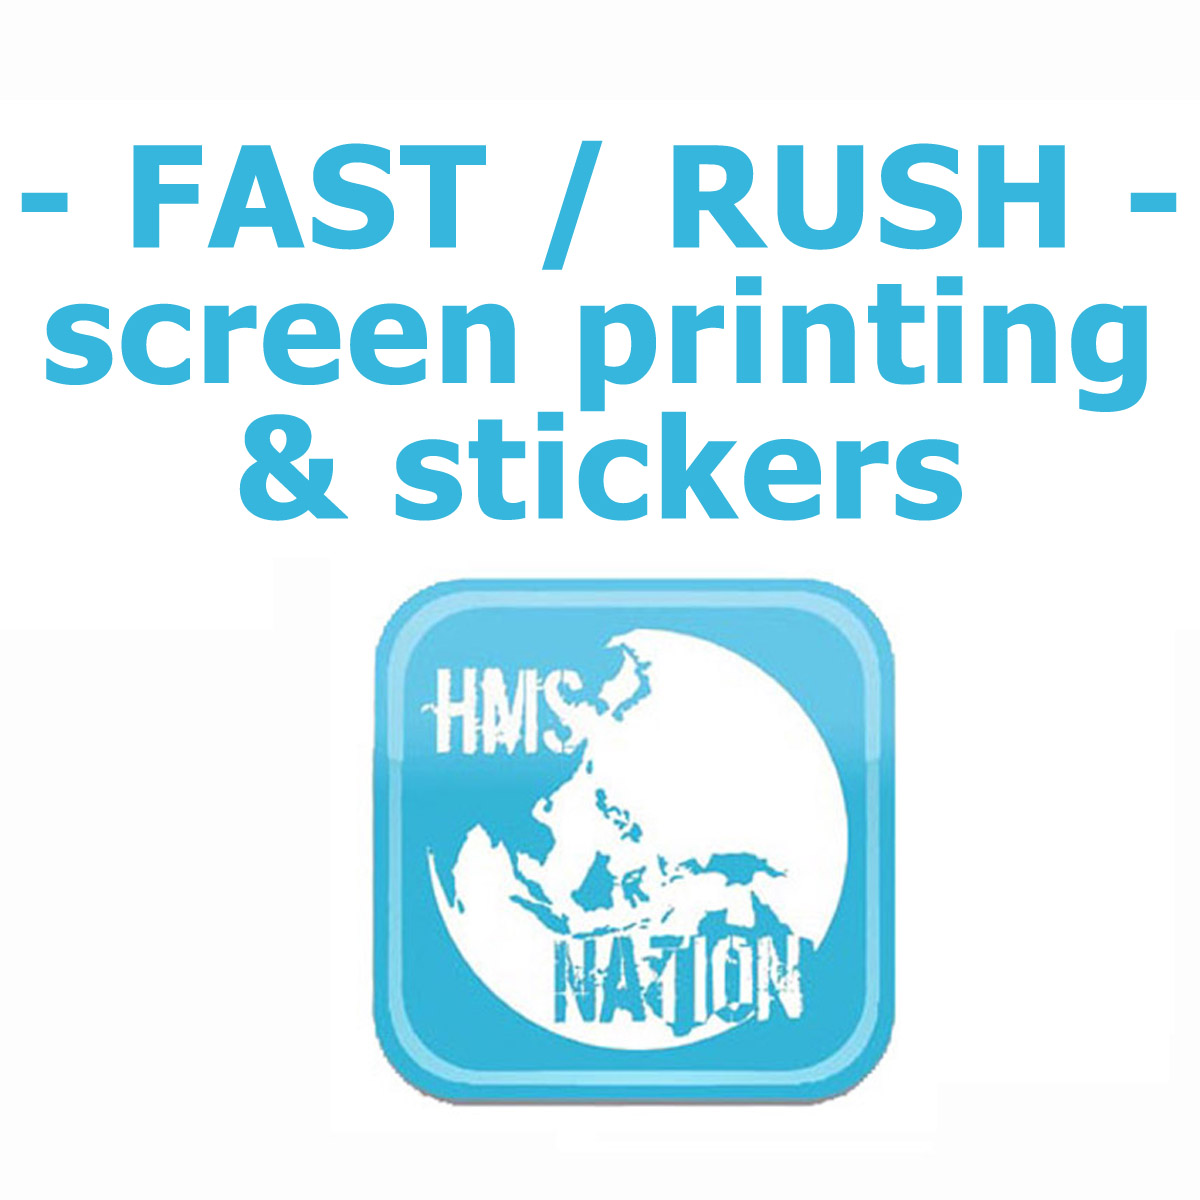 Screen print rush order portland hms nation hart mind soul